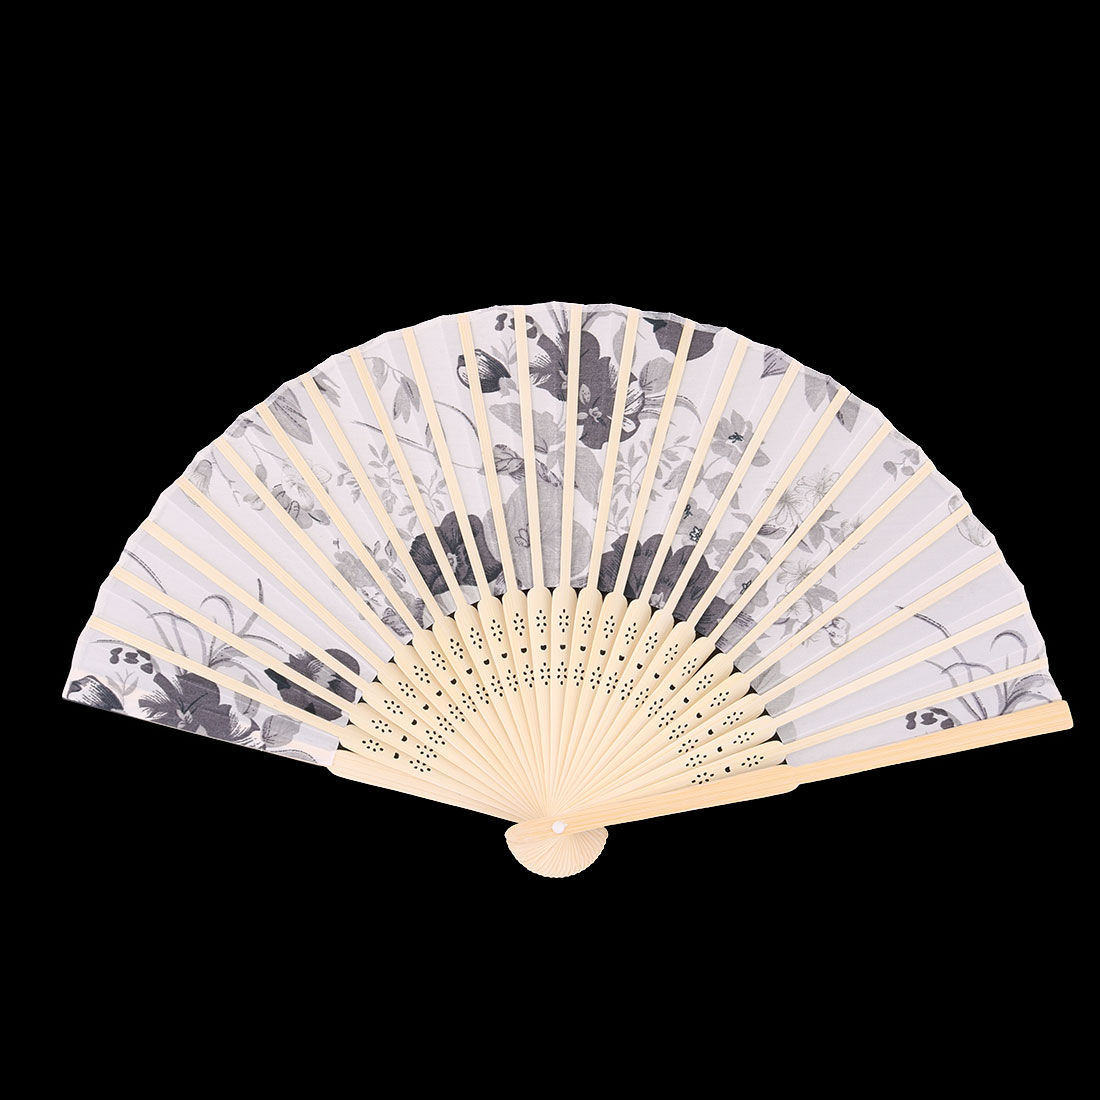 Wedding Bamboo Frame Flower Pattern Decorative Folding Dancing Hand Fan Gray - image 3 de 4